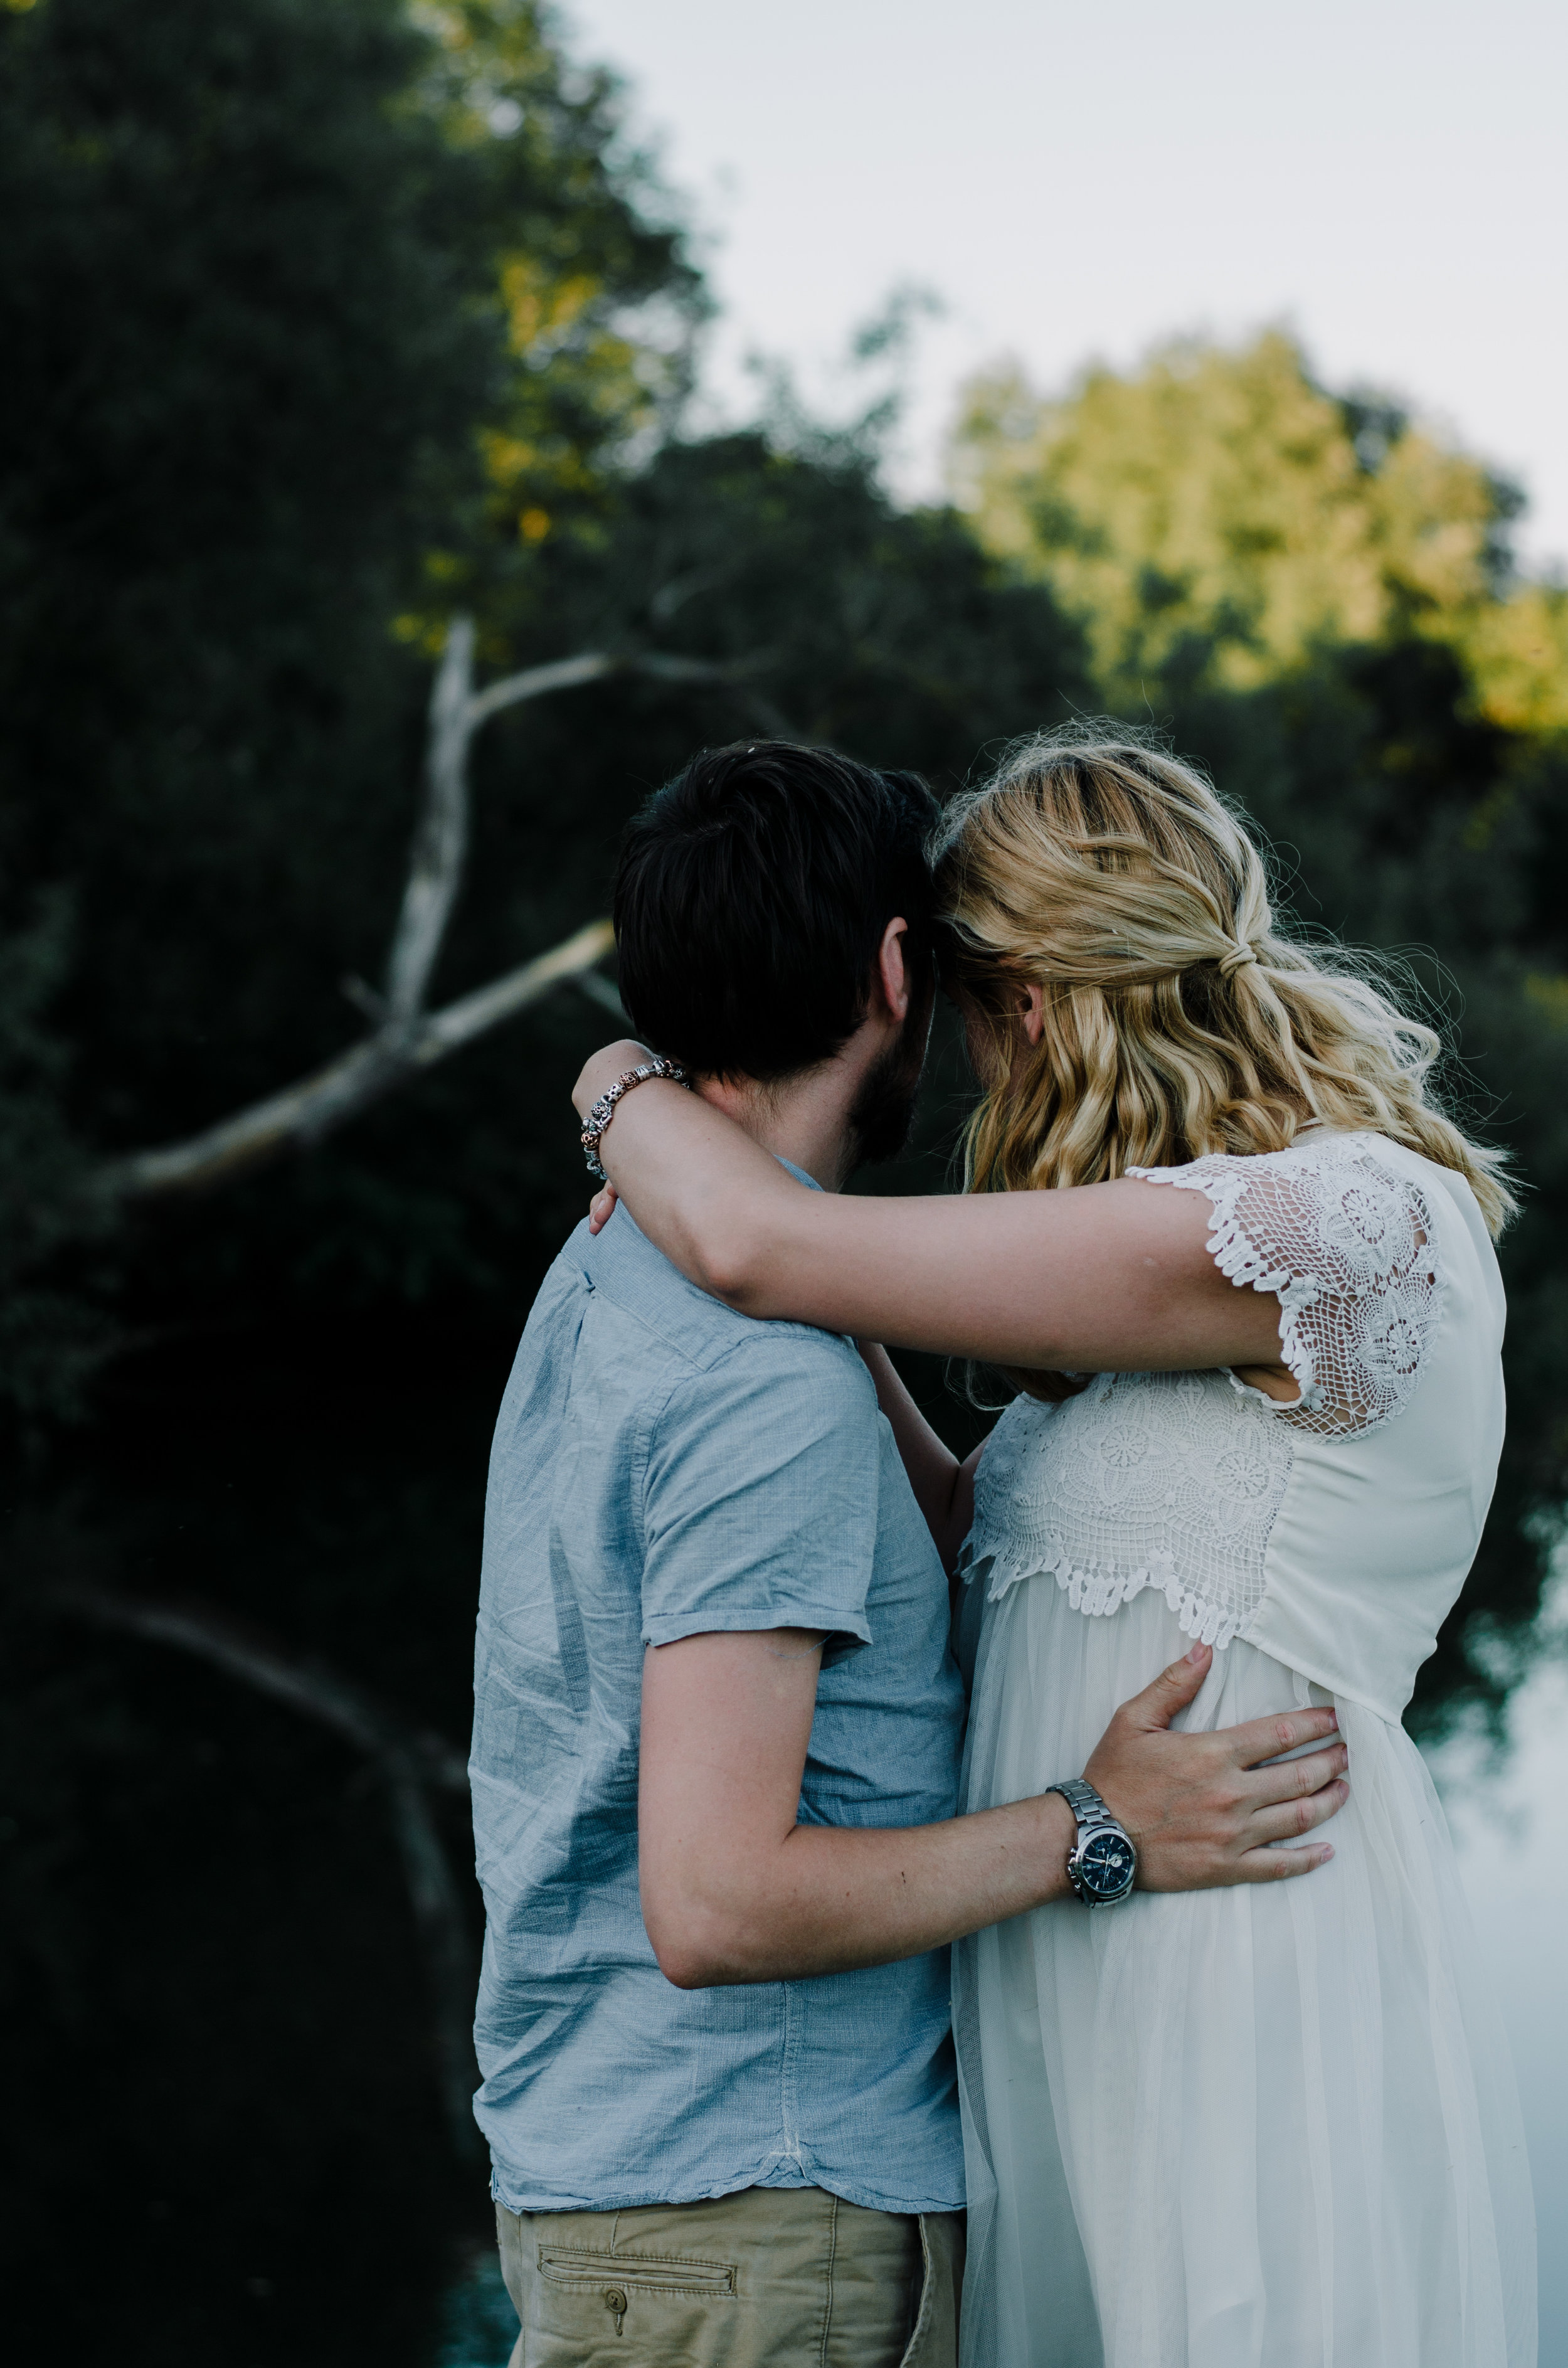 Gina & Chris - Barcombe Mills - Couple Session - Aiste Saulyte Photography-47.jpg